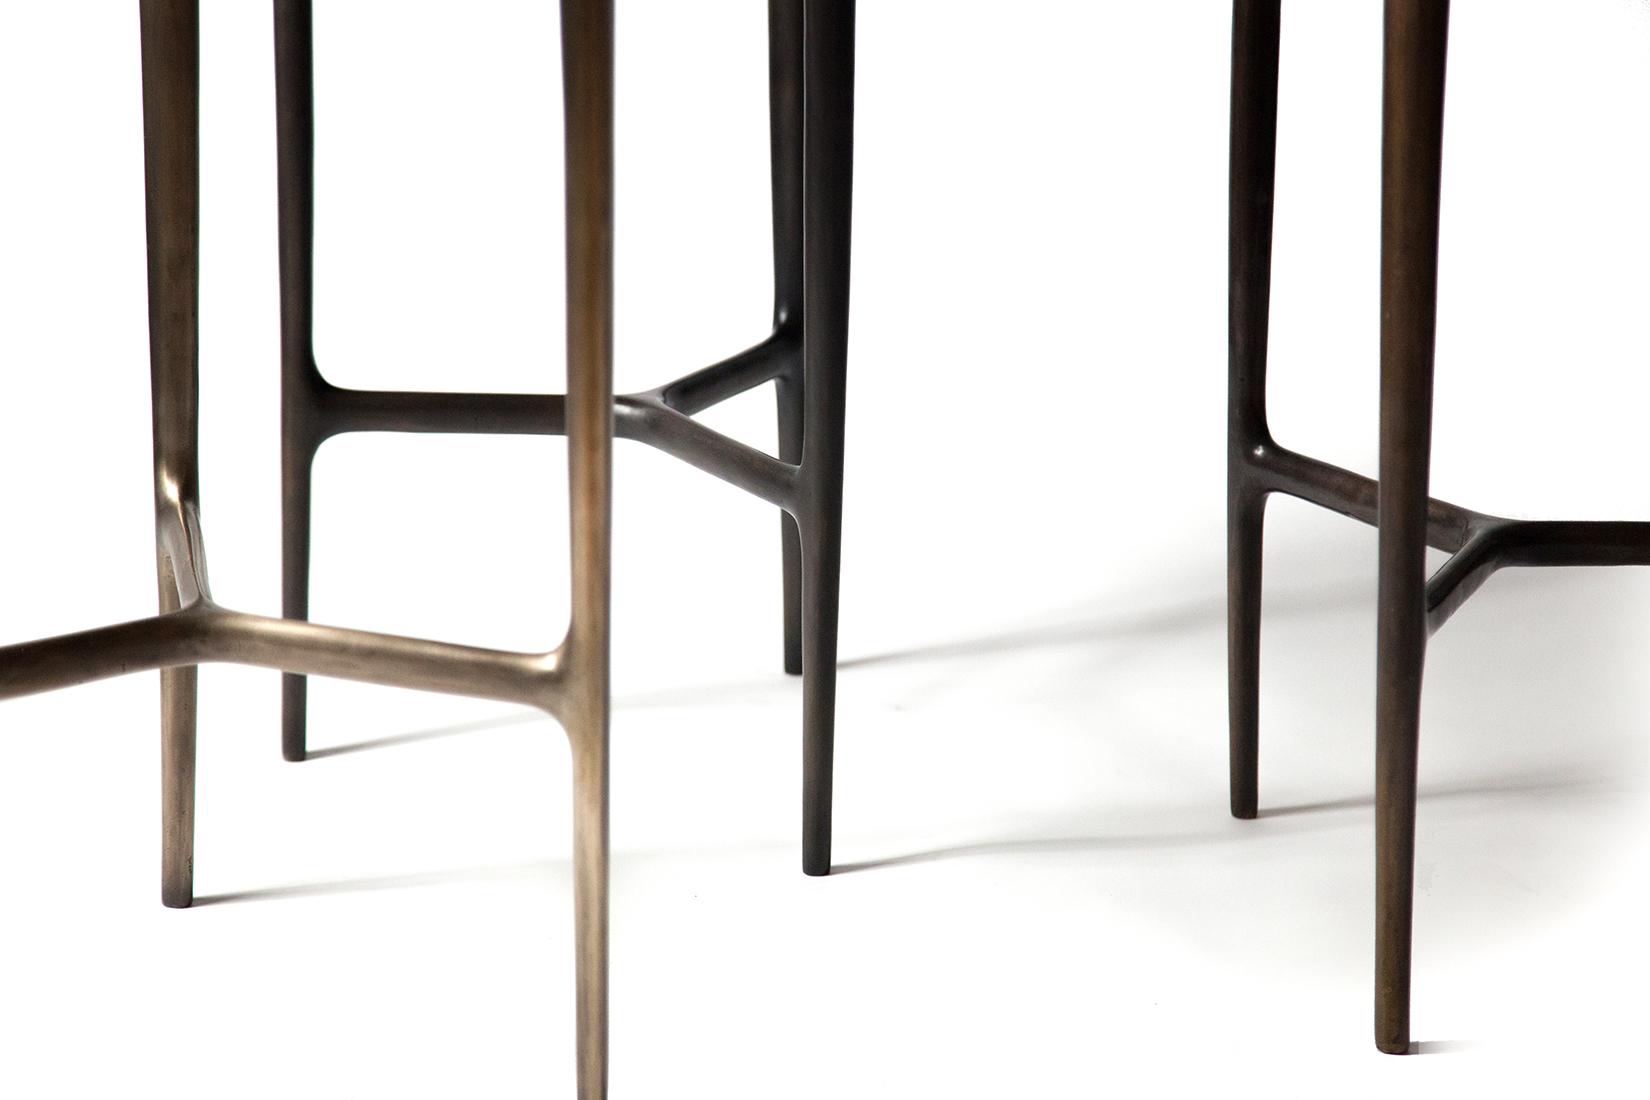 ELLIOT-EAKIN-FURNITURE-Ages-Occasional-Table-Legs.jpg